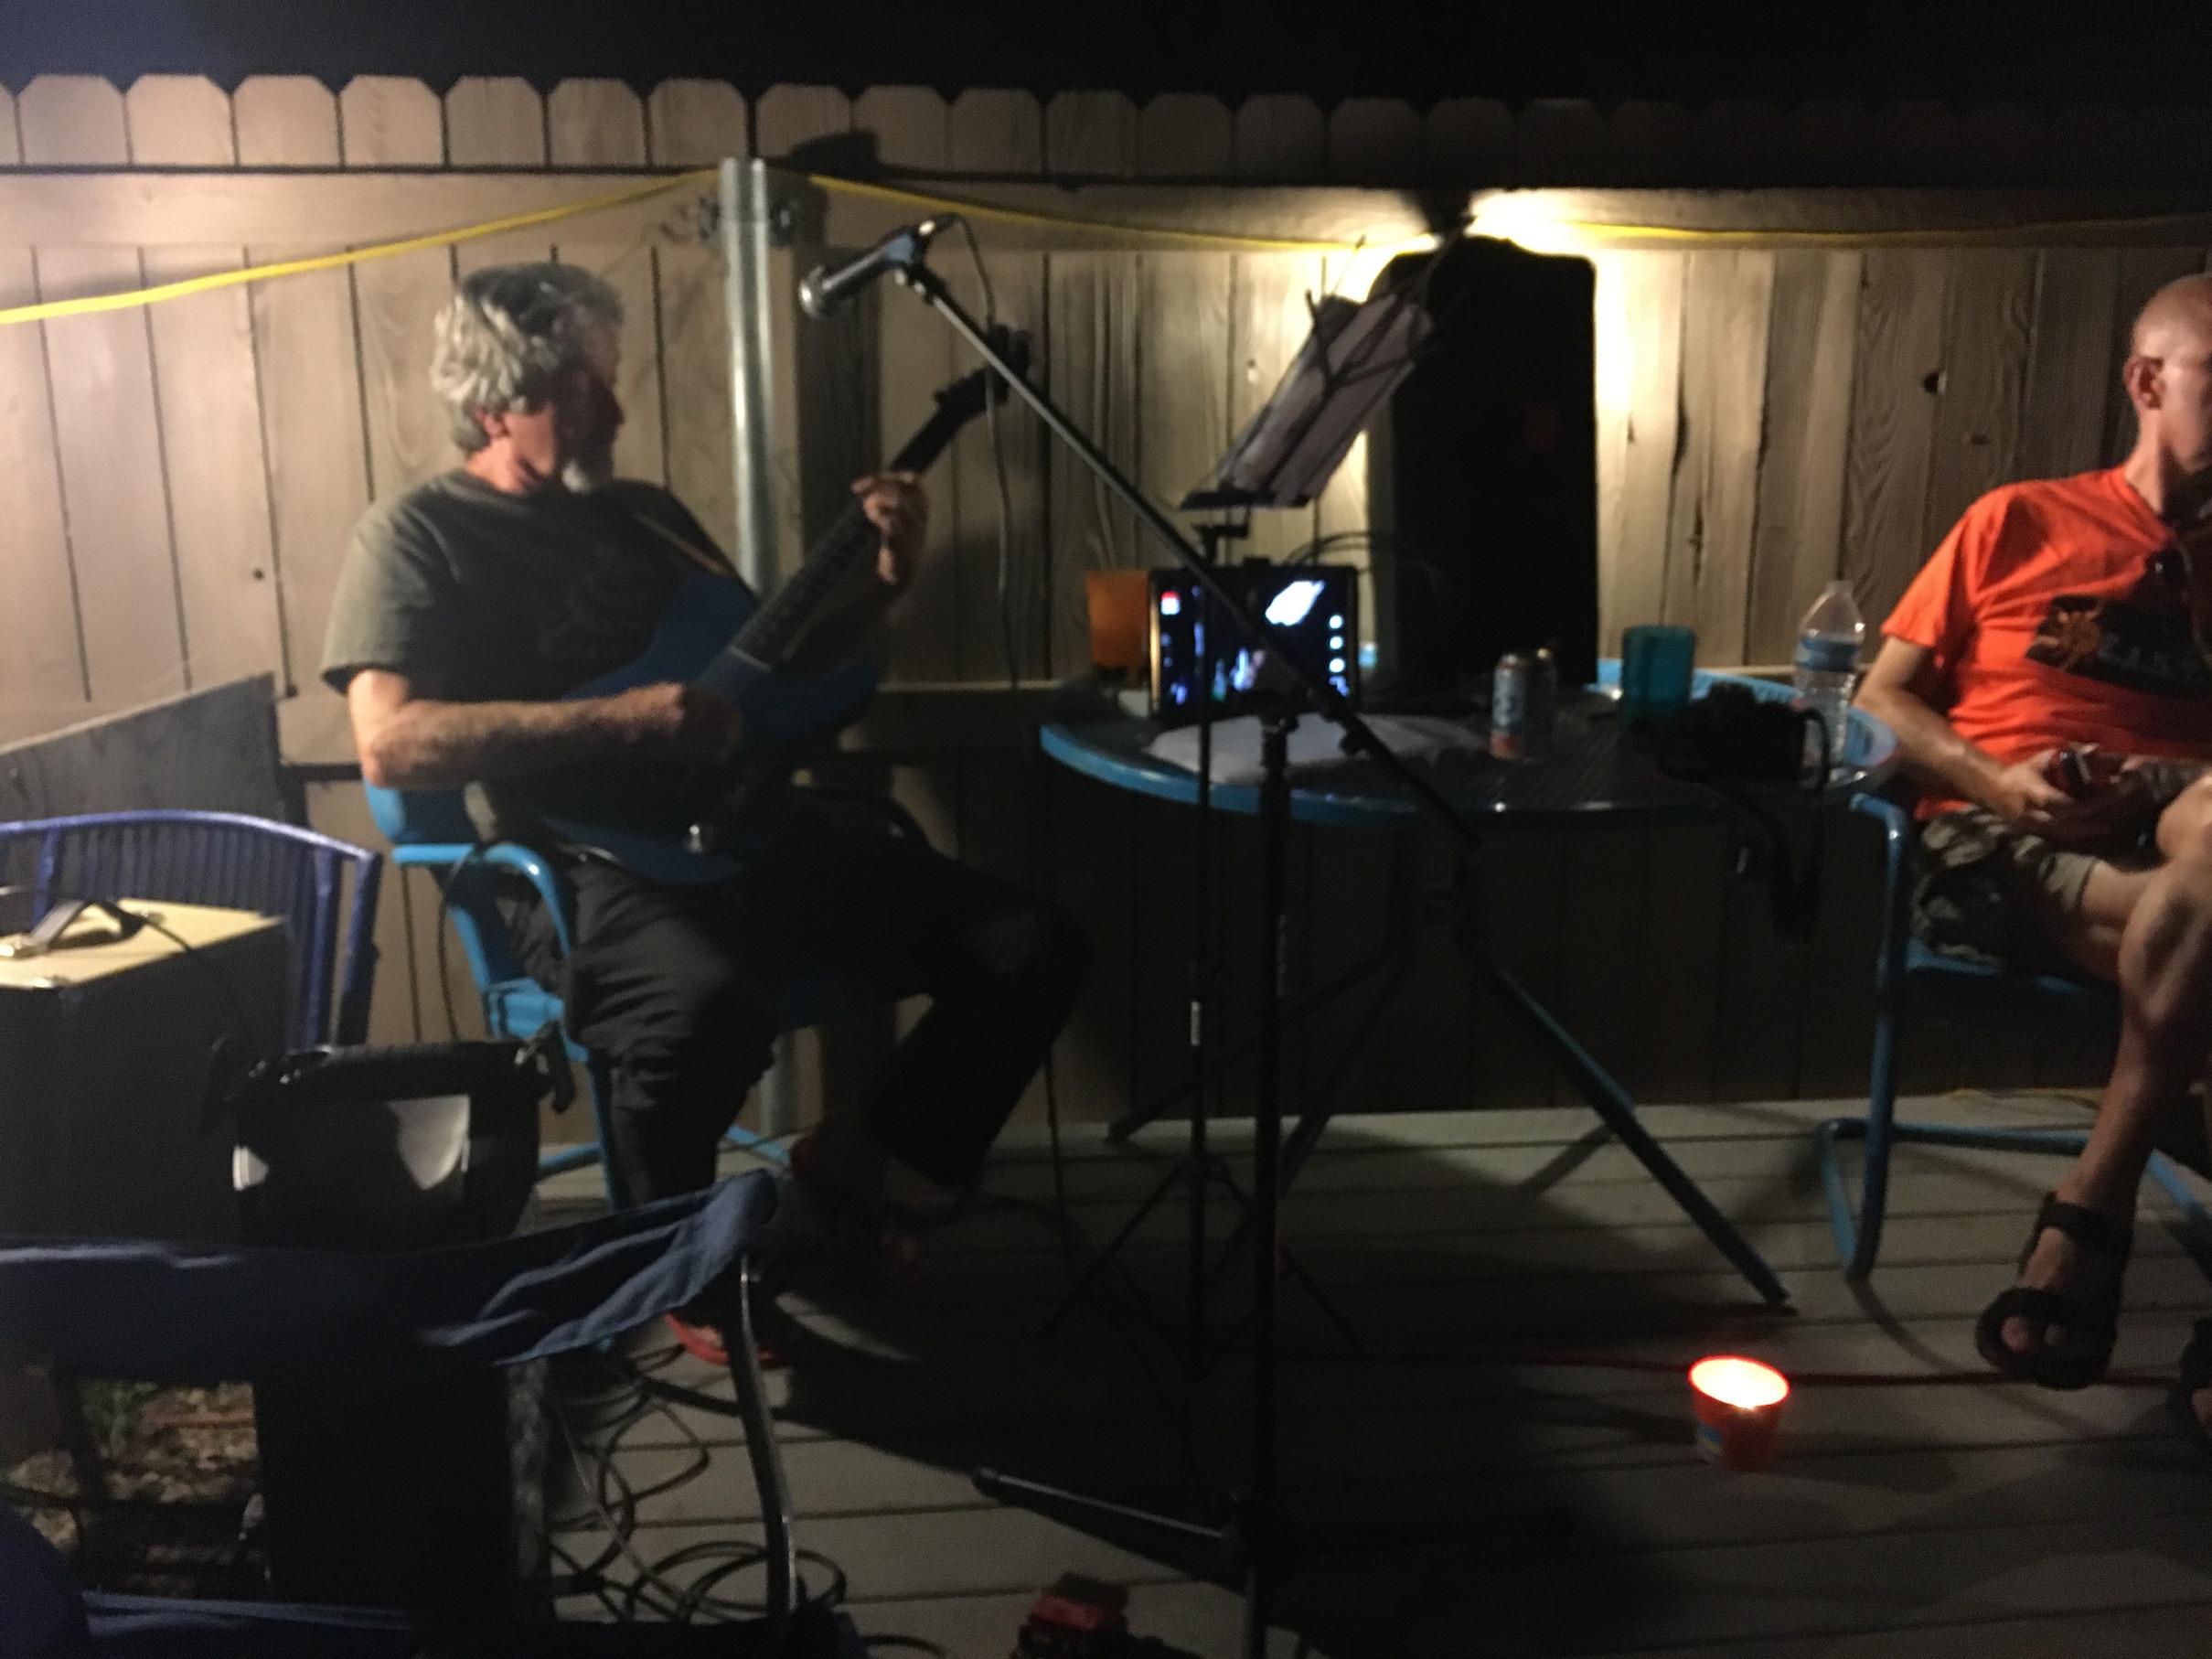 backyard activities music jam pueblo house james smith on guitar